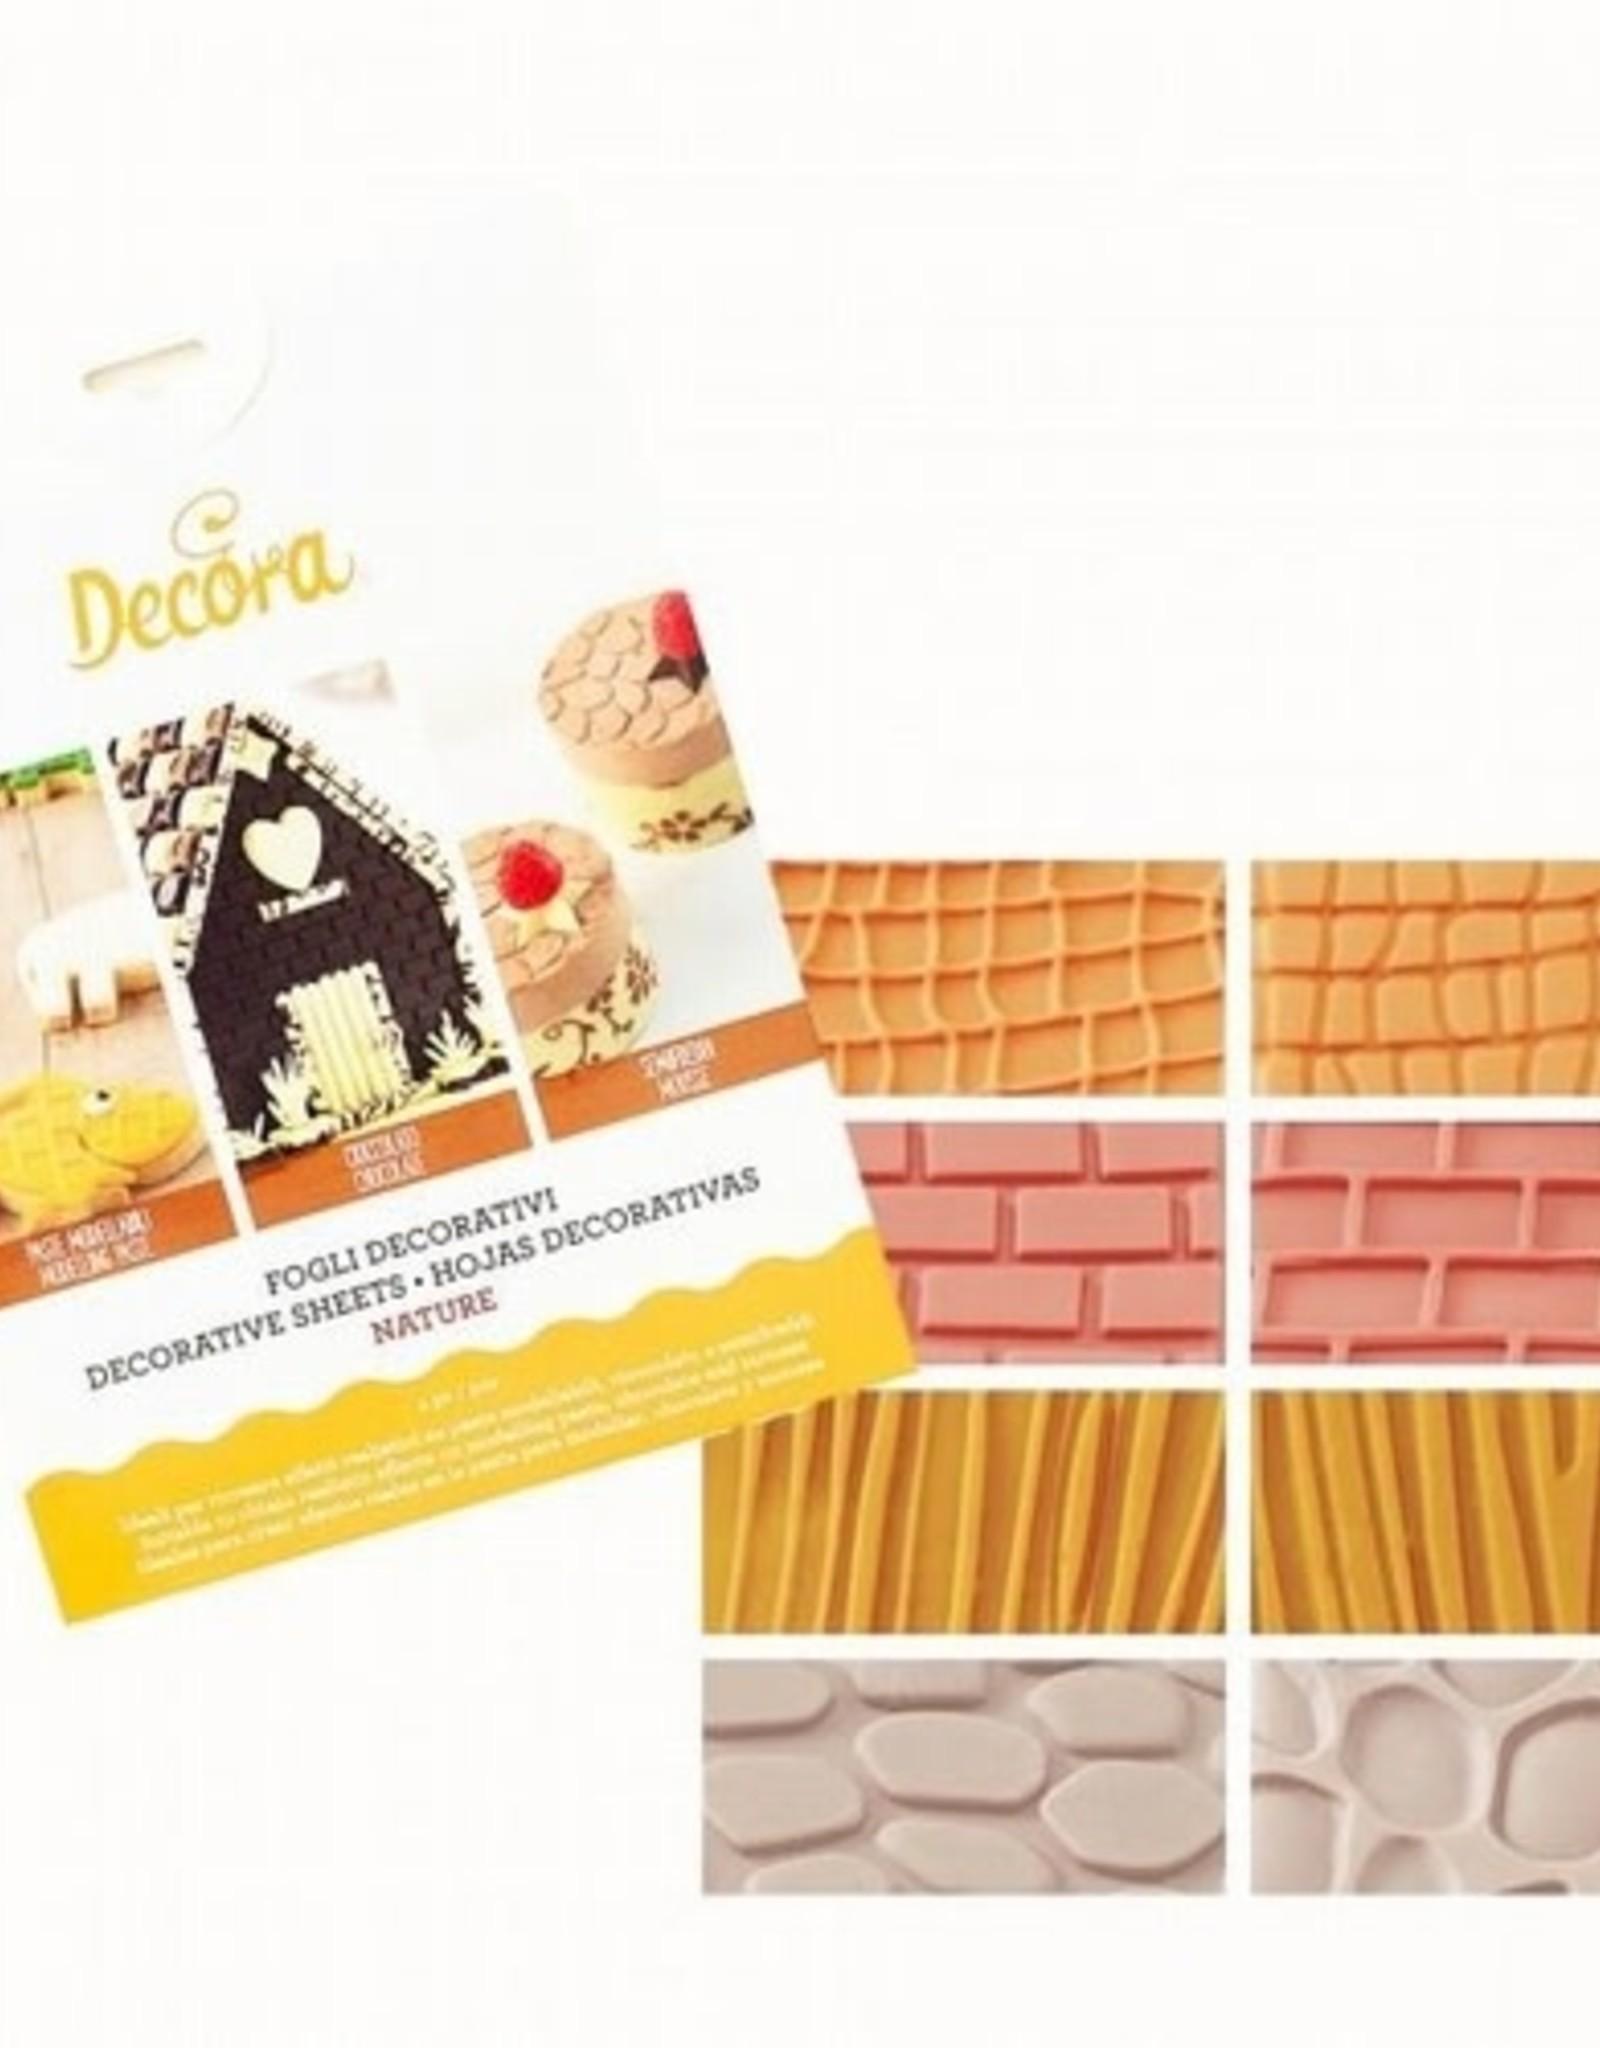 Decora Decora Decorative Sheets Set/4 Wall/Wood/Stone/Leather